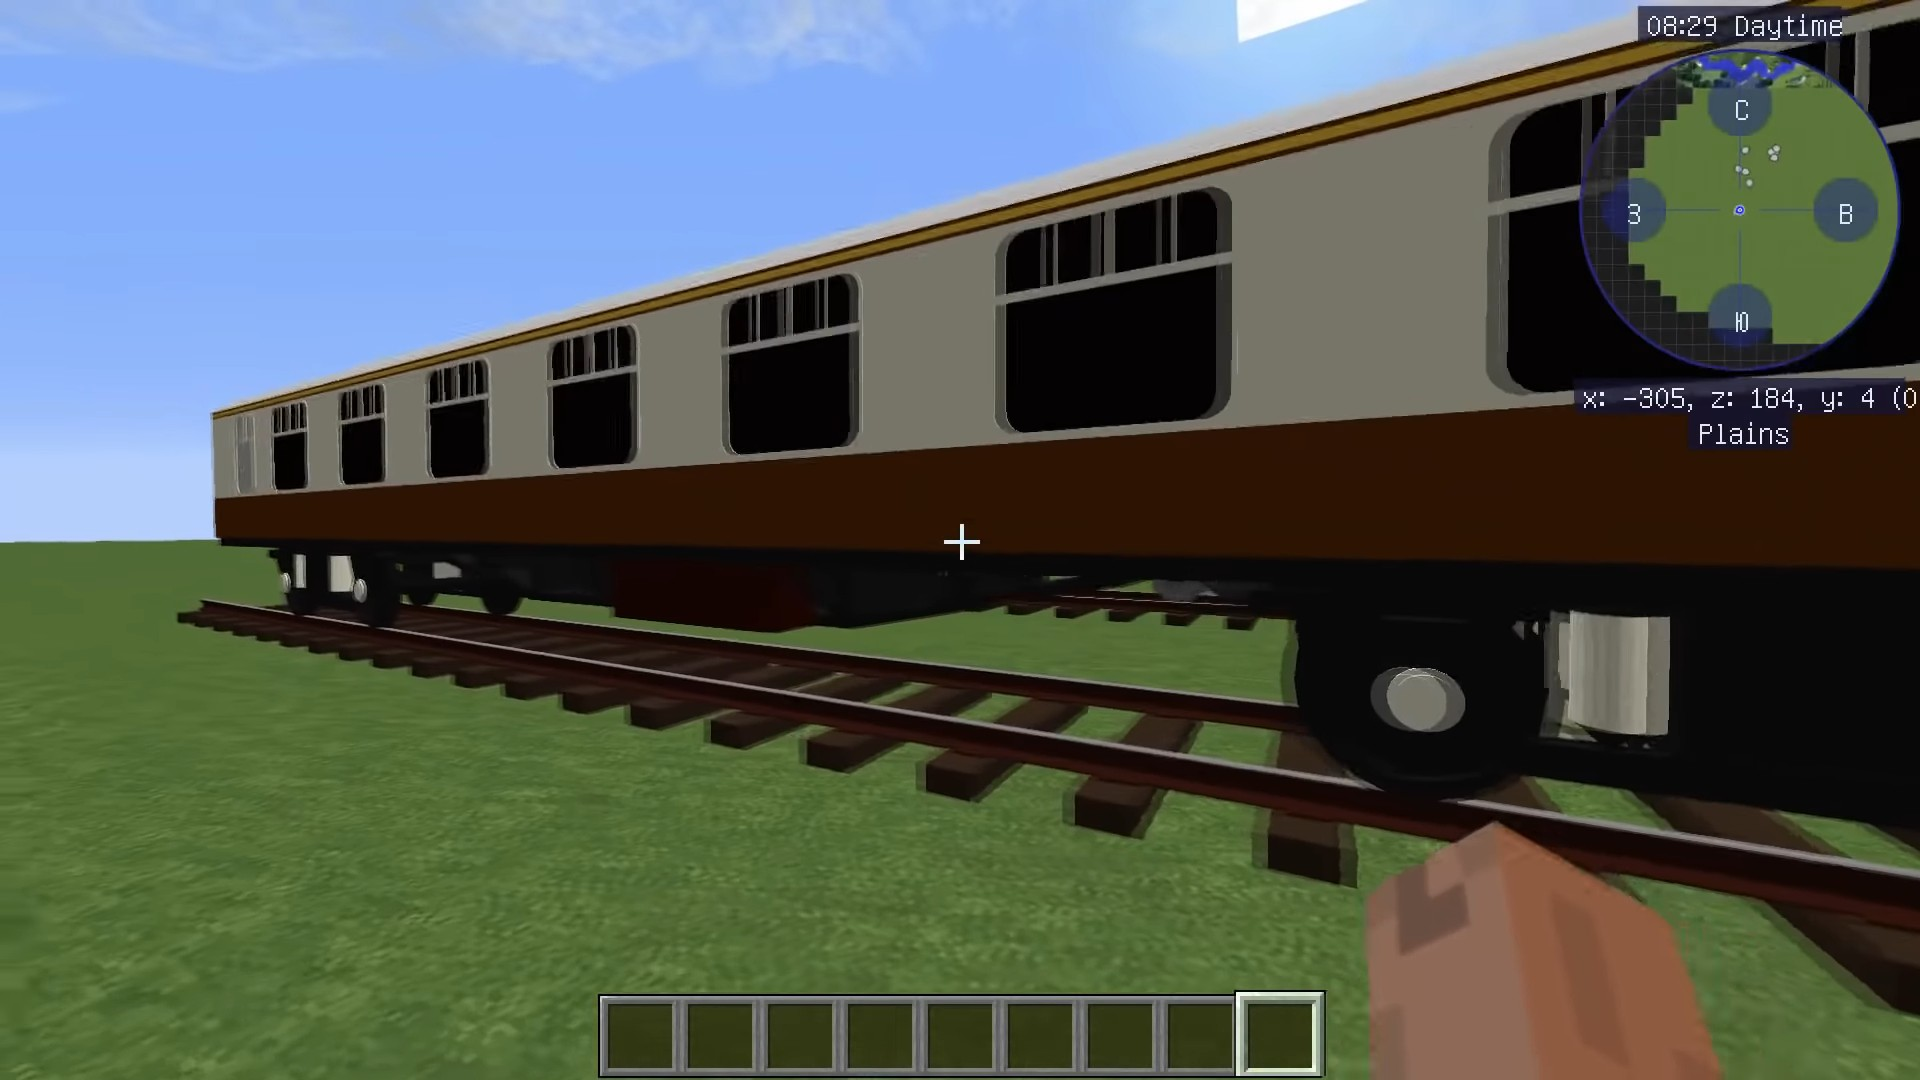 Мод Immersive Railroading - скриншот 5